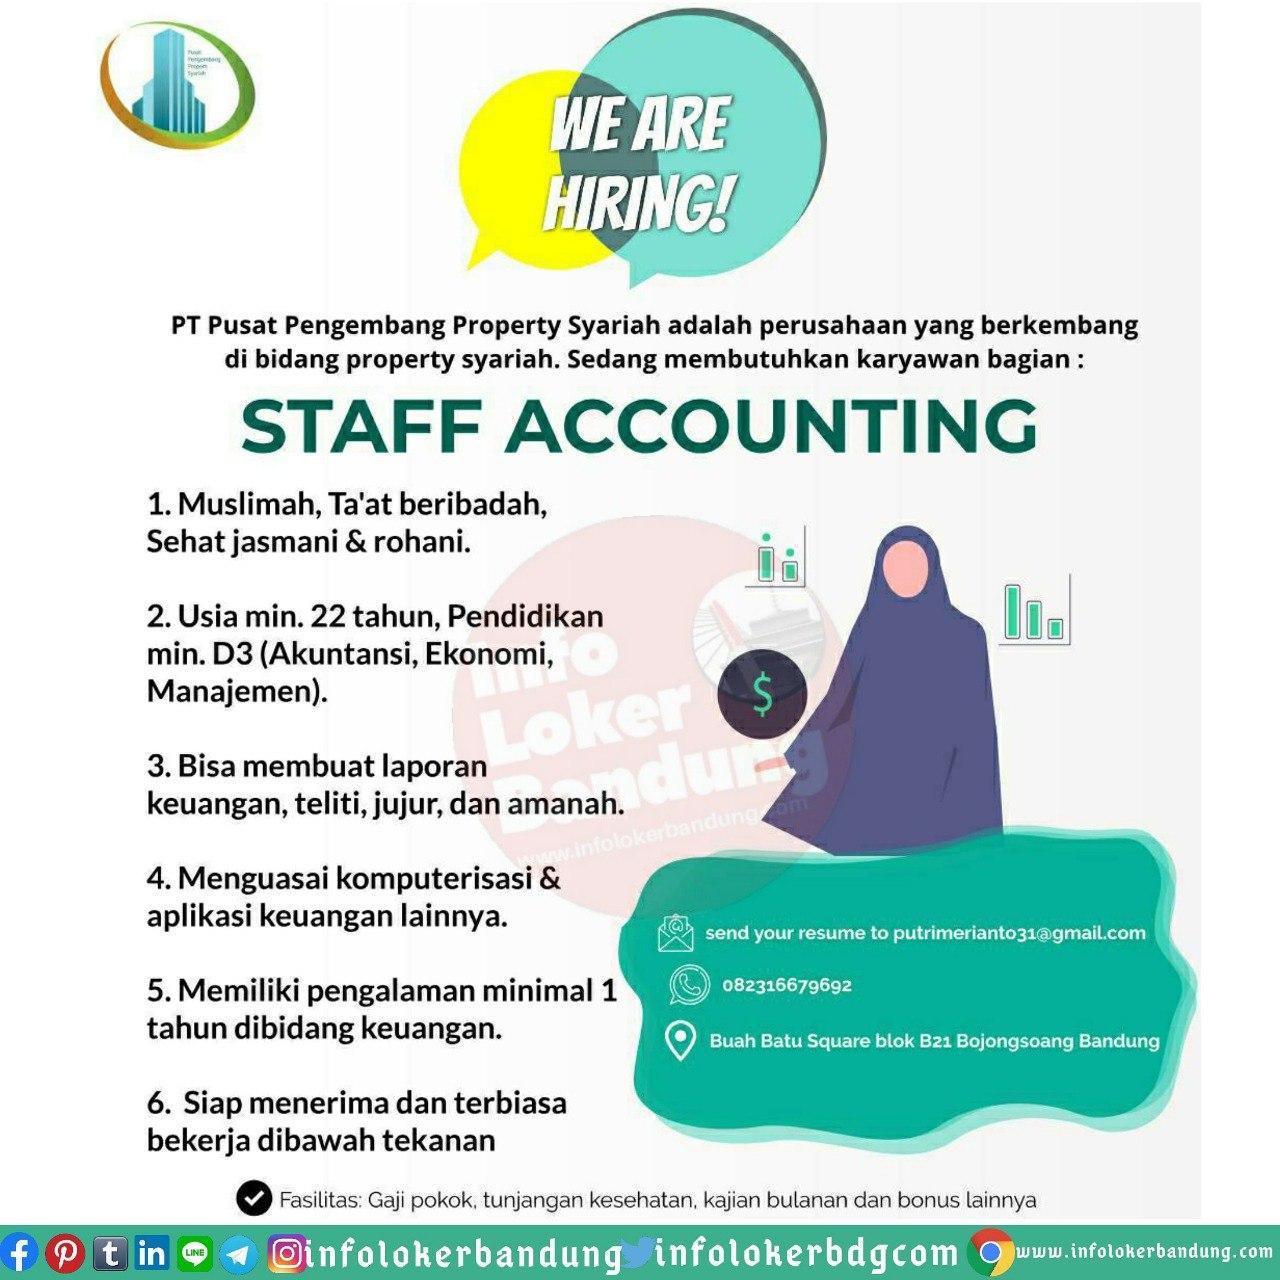 Lowongan Kerja Staff Accounting PT. Pusat Pengembang Property Syariah Bandung Juini 2020